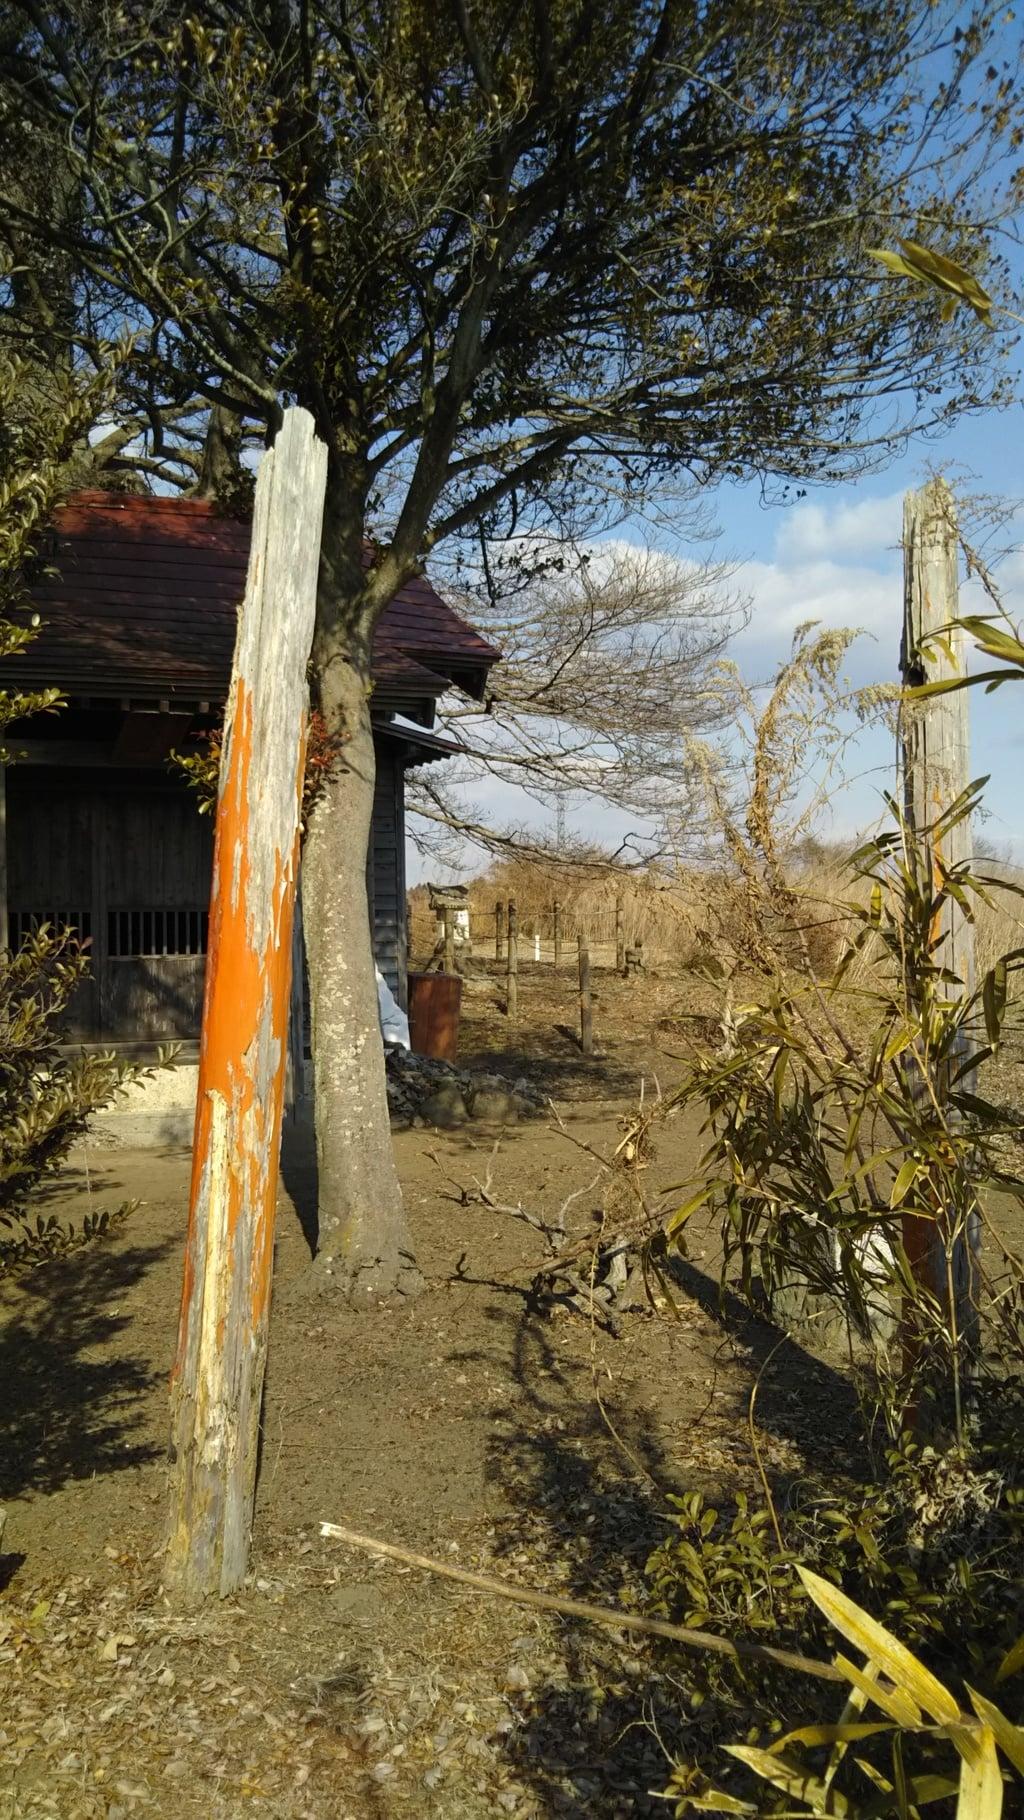 桂木稲荷神社の鳥居